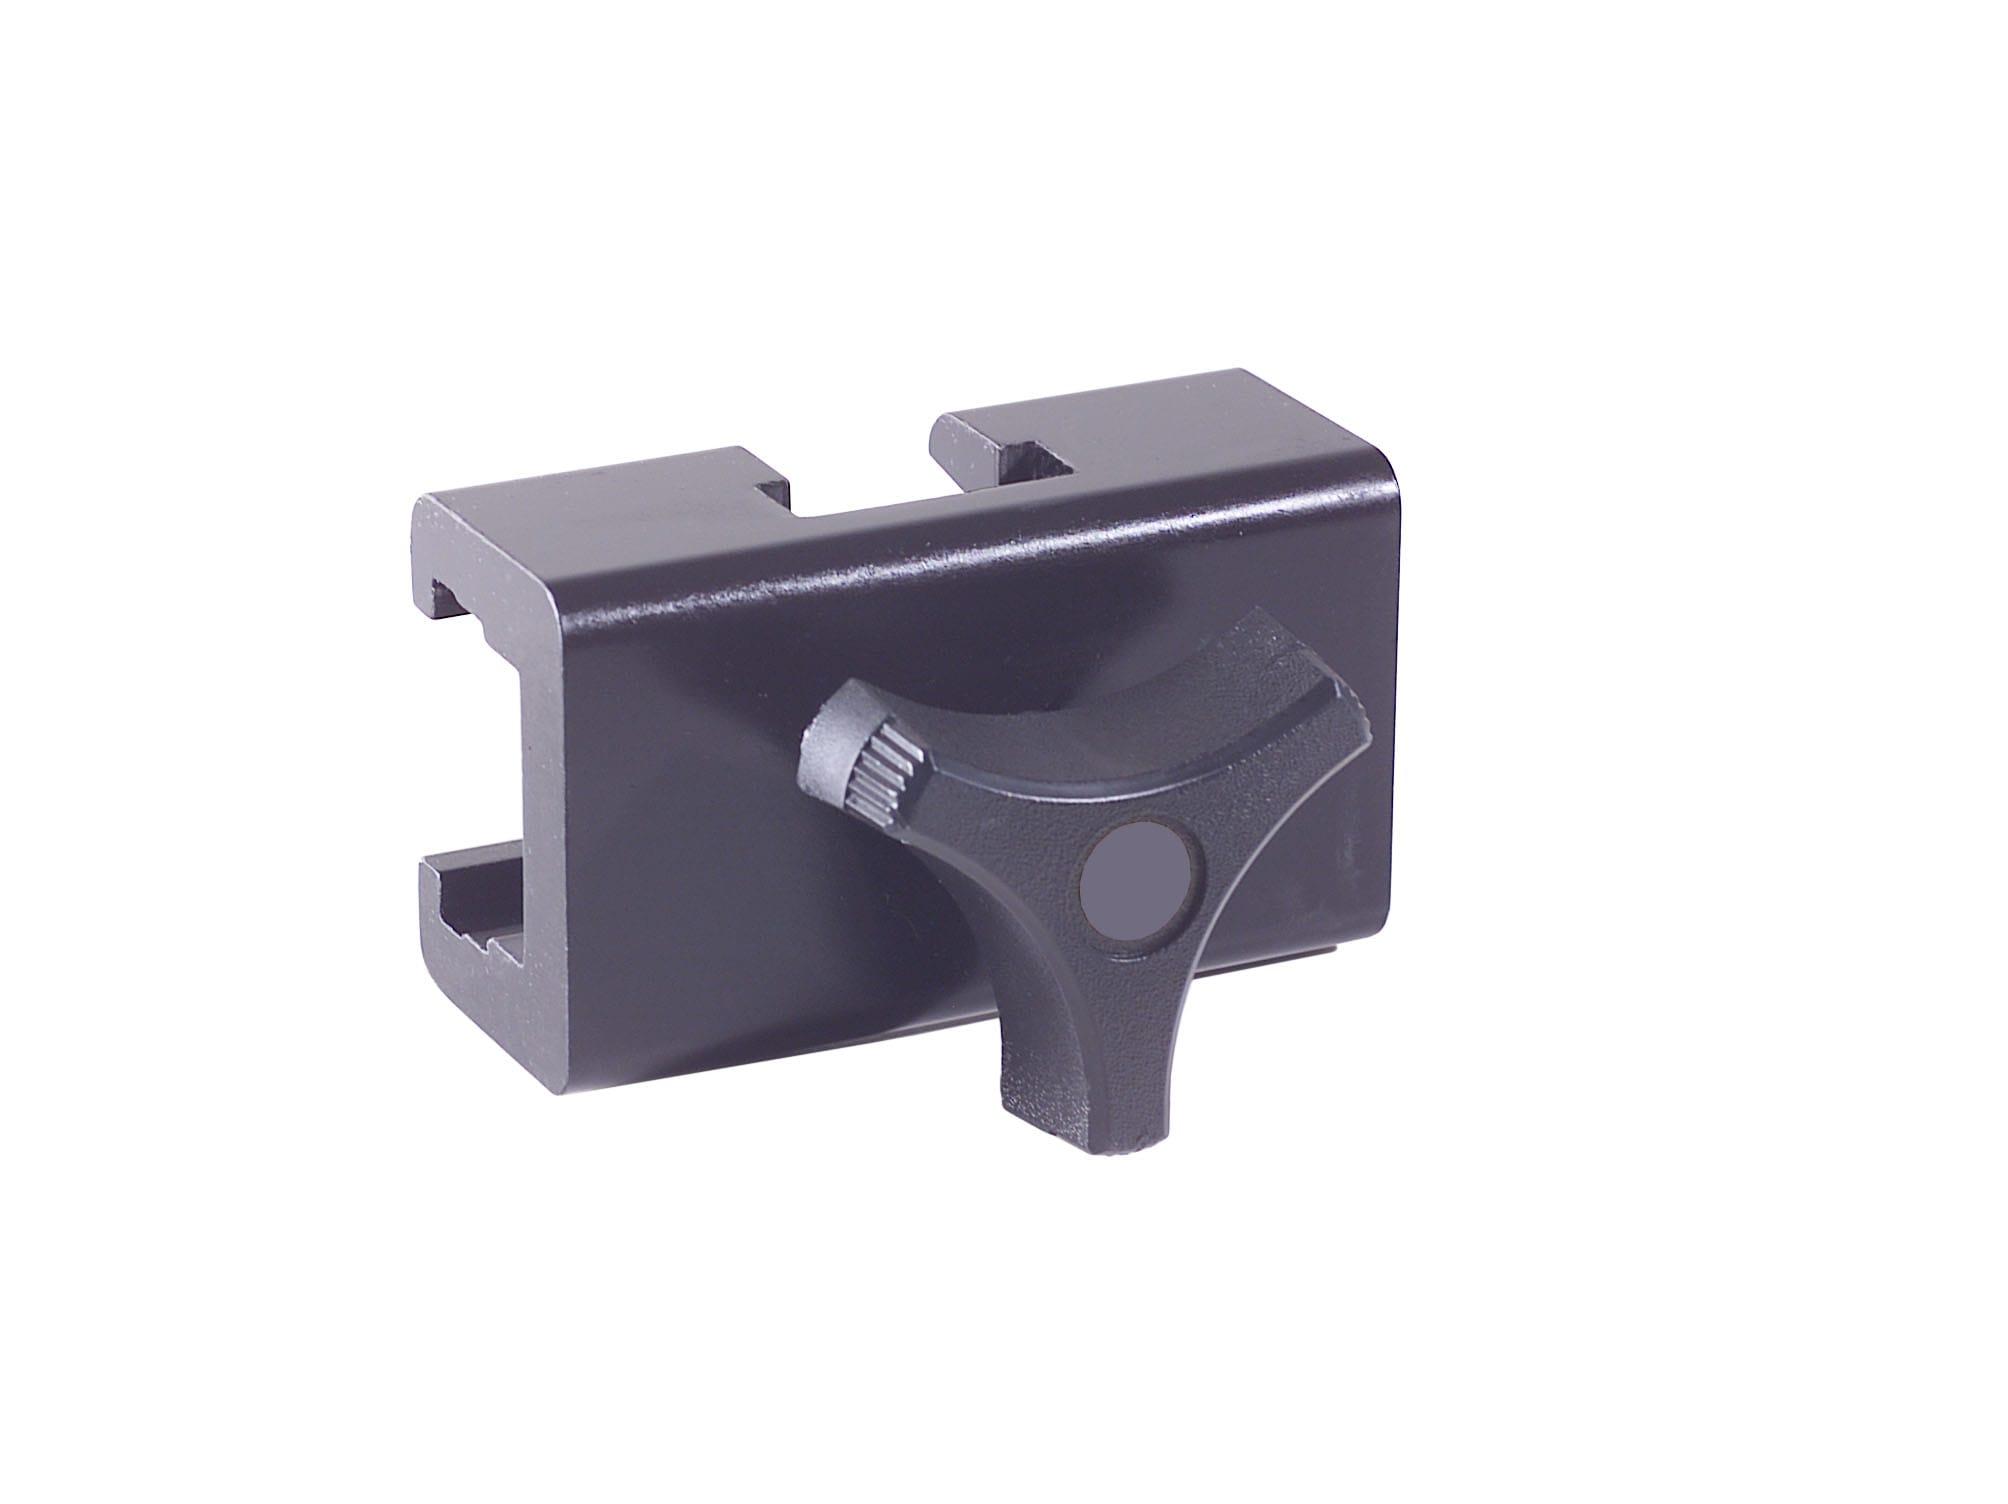 Clamp - Basic Blade Handwheel - for UK and EU Side Bar